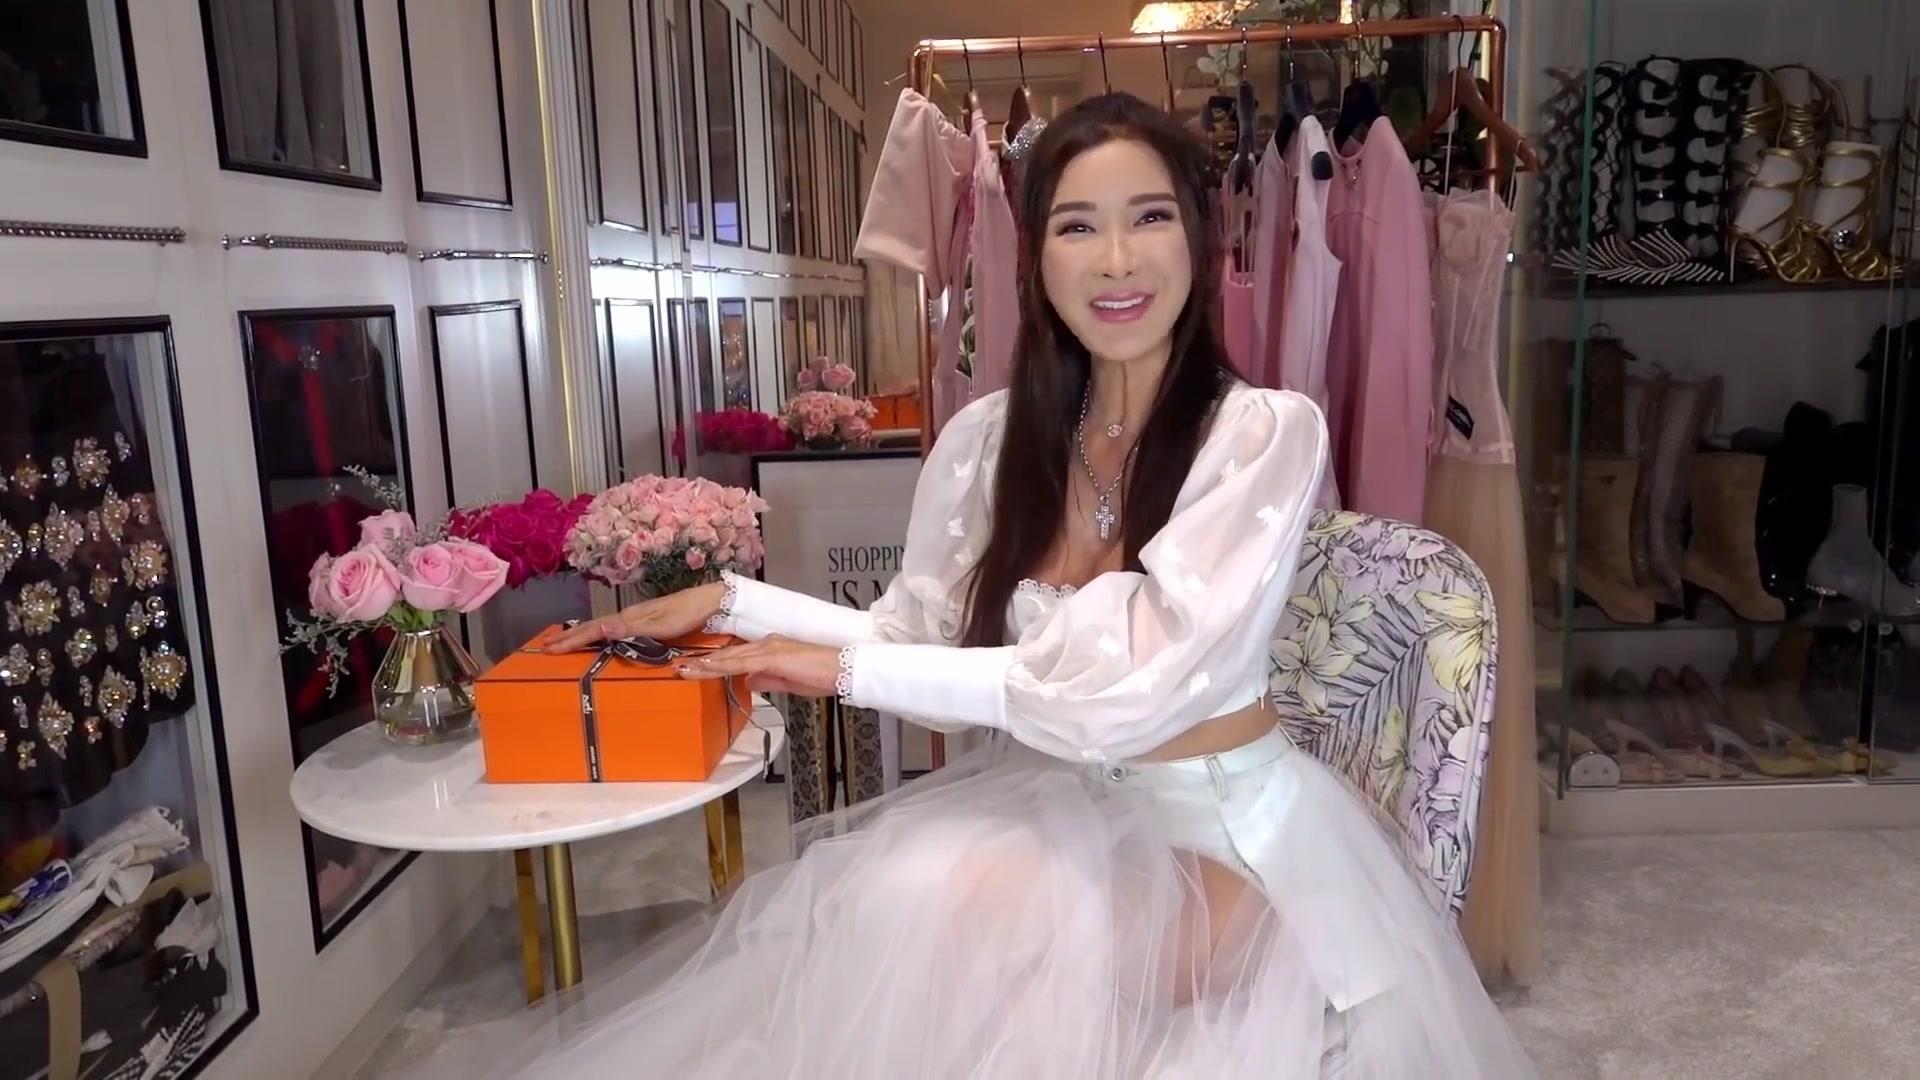 【Jamie Chua】爱马仕女王来开箱!超稀有迷你凯莉包